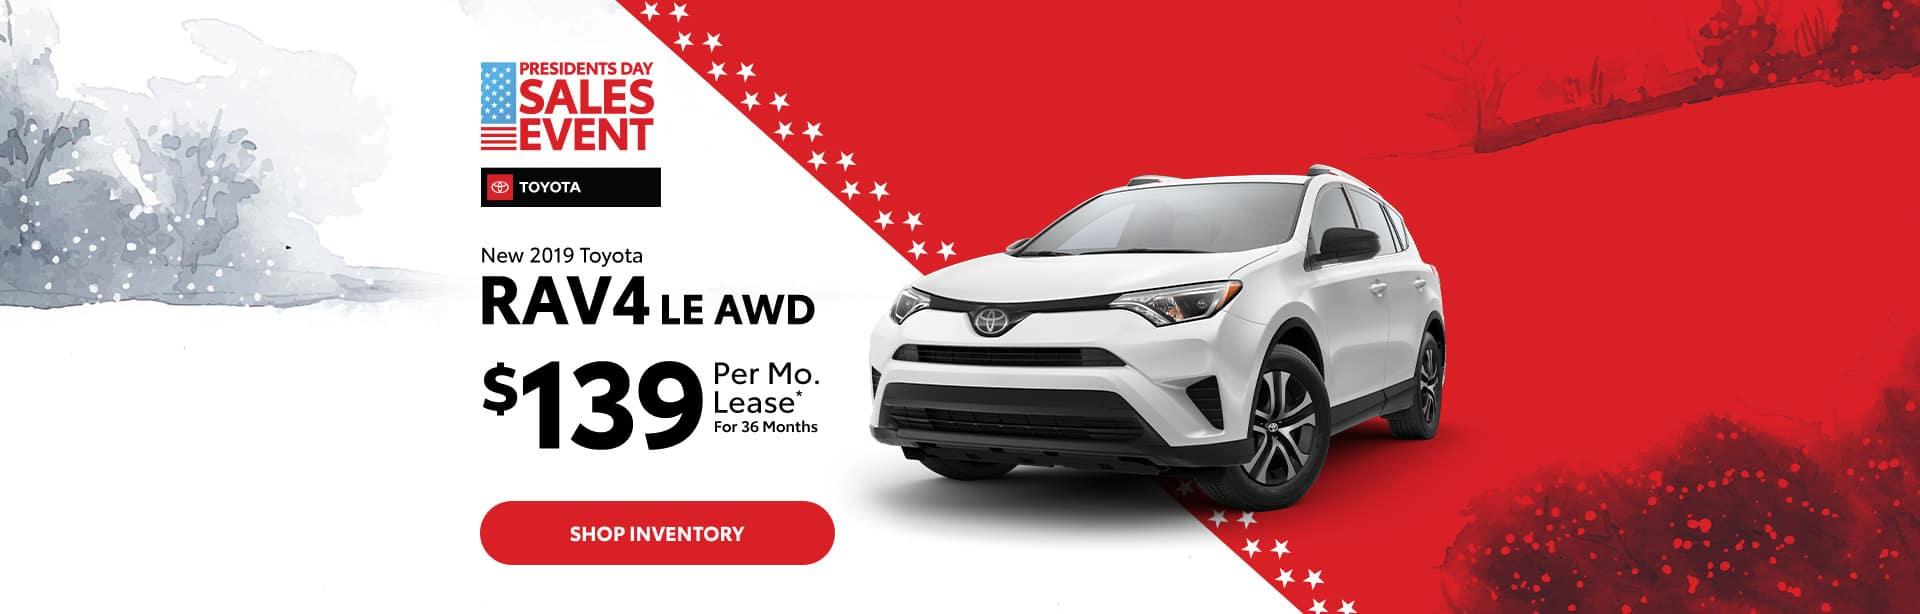 Best Deal on a New RAV4 near Greenwood, Indiana.